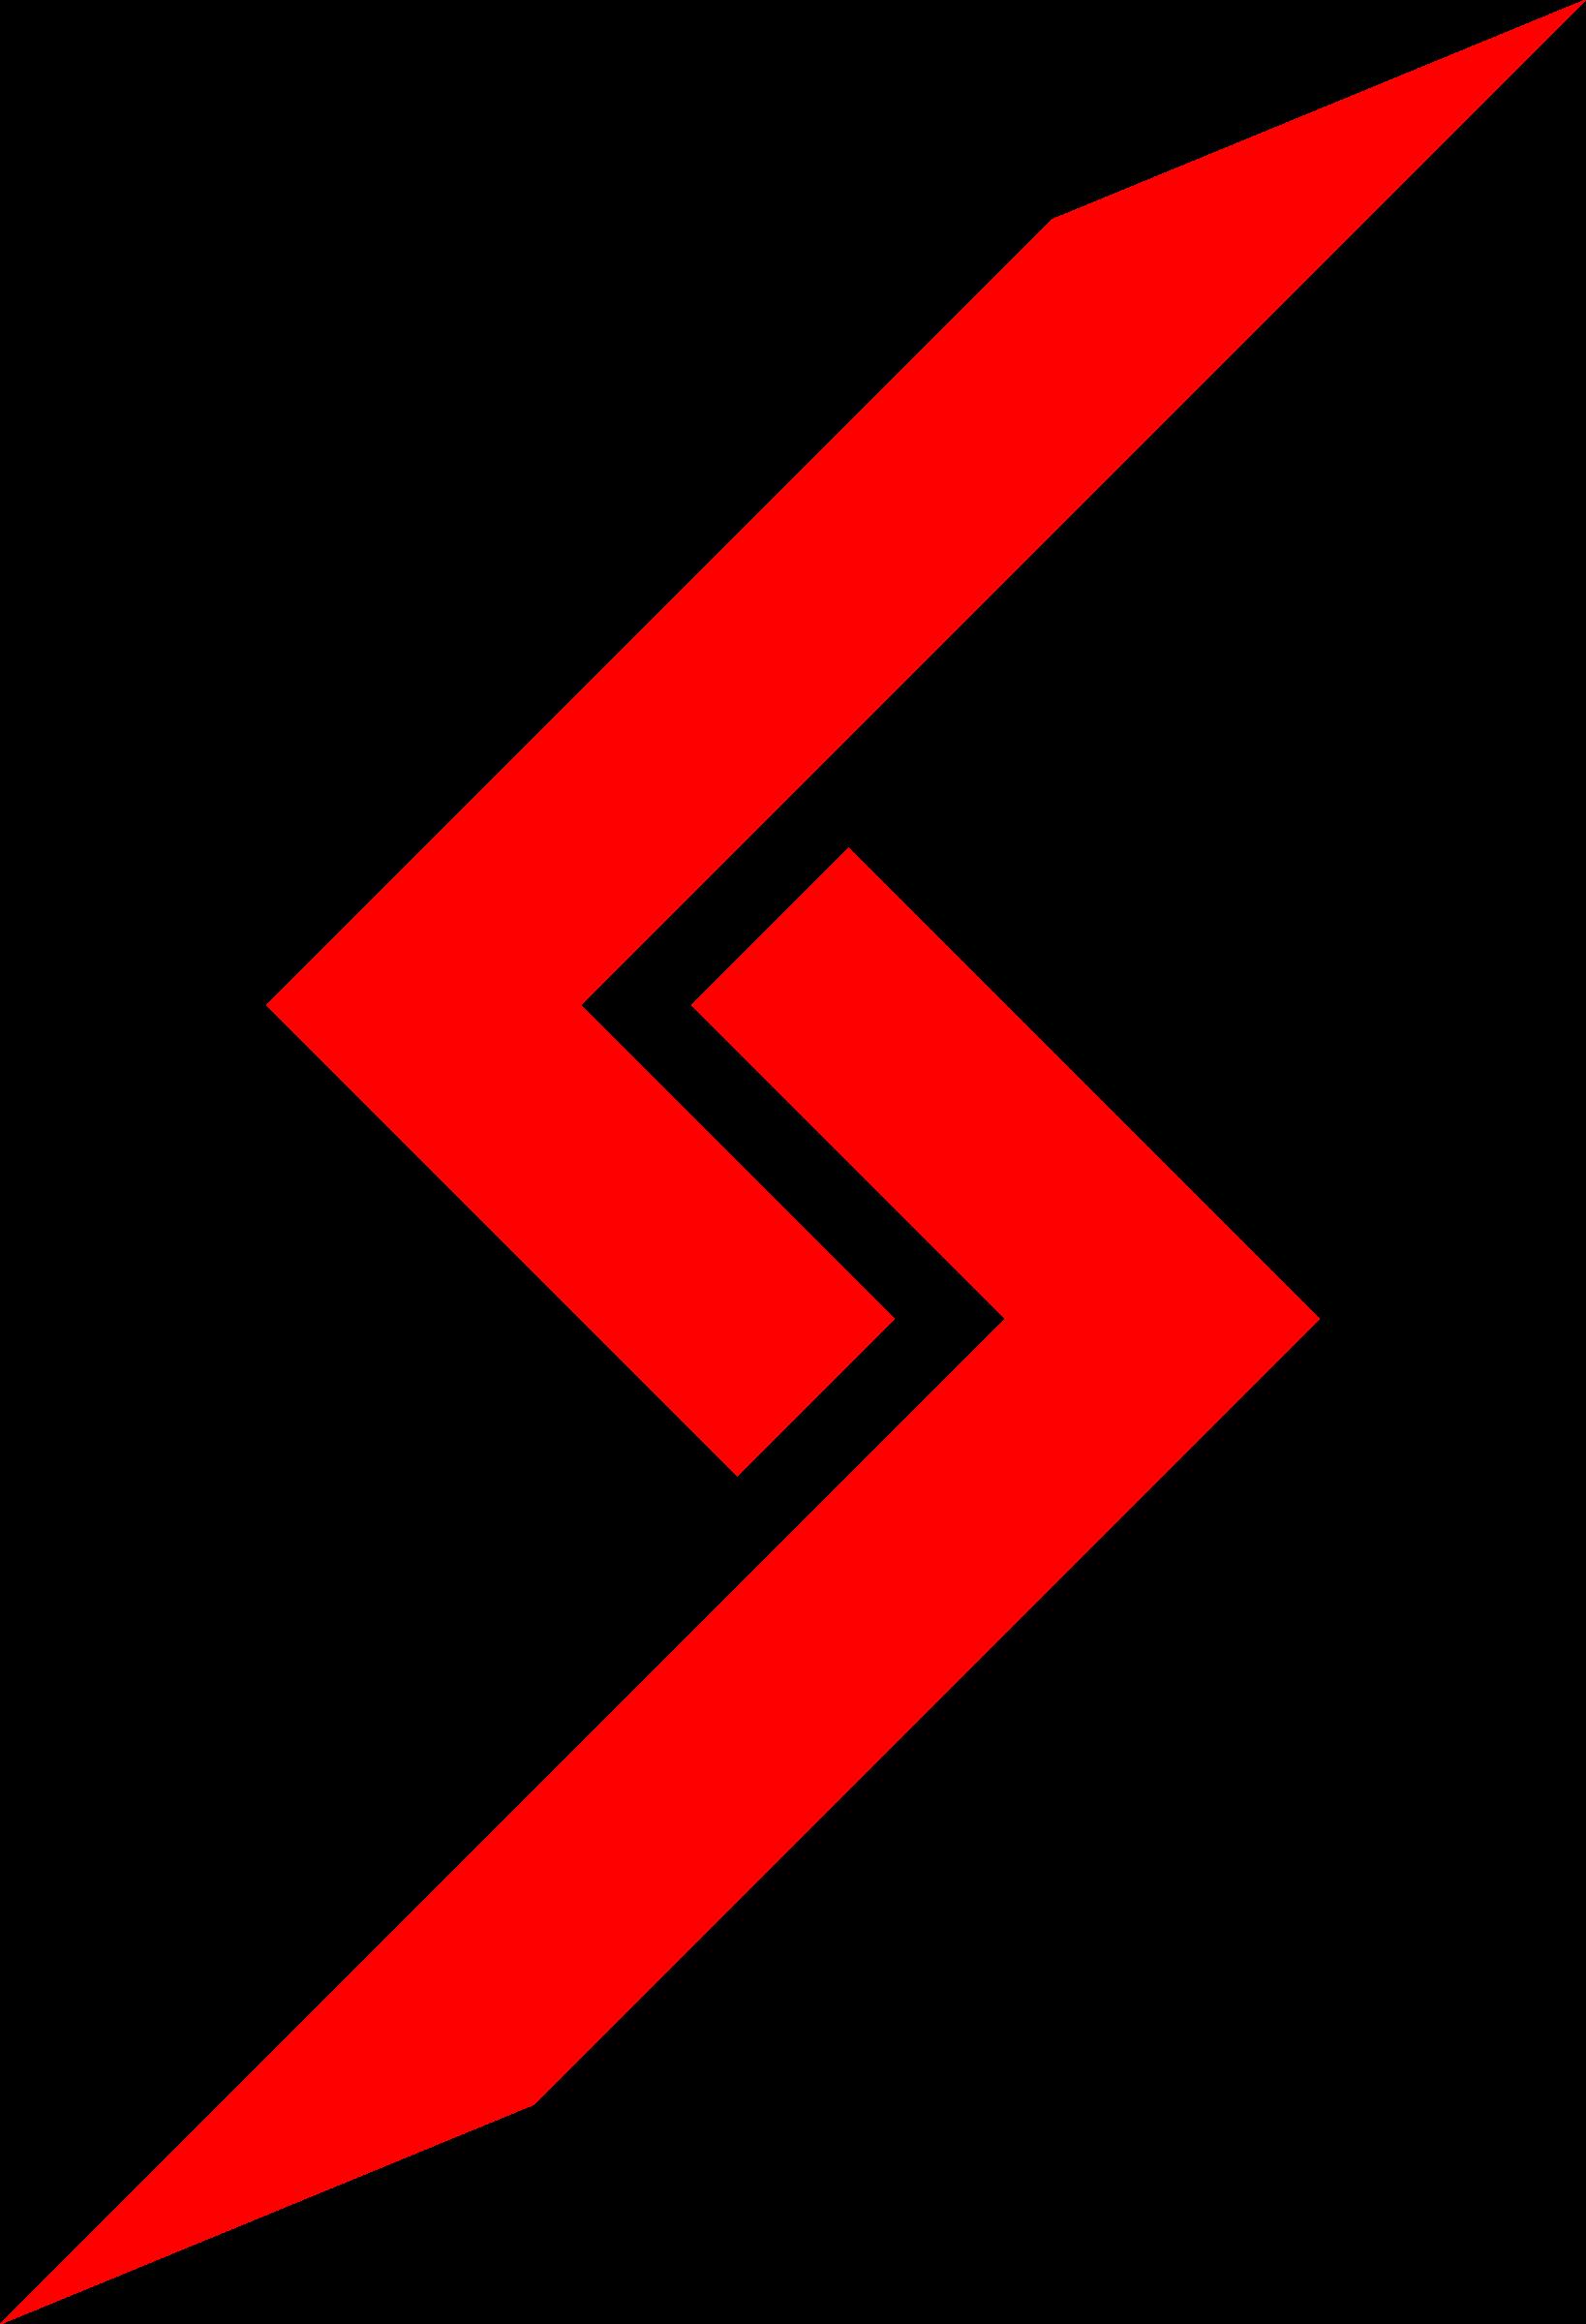 Clipart digital storm logo for Logo clipart